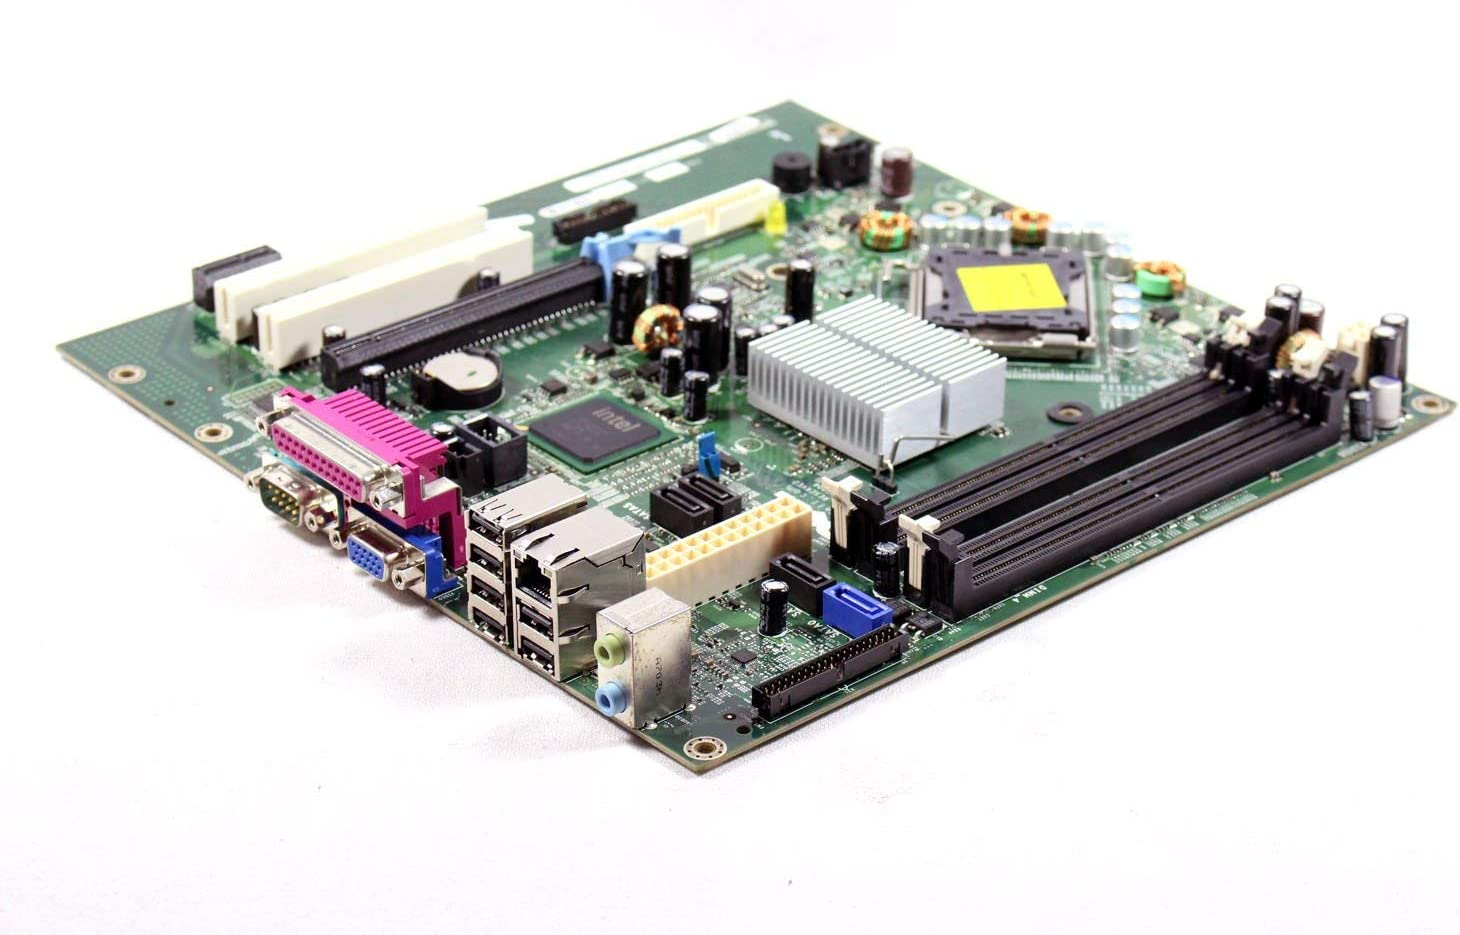 Genuine Dell TY565 HR330 RF703 Optiplex 745c 745 755 Intel Q965 Express Socket 755 LGA755 Tower Motherboard